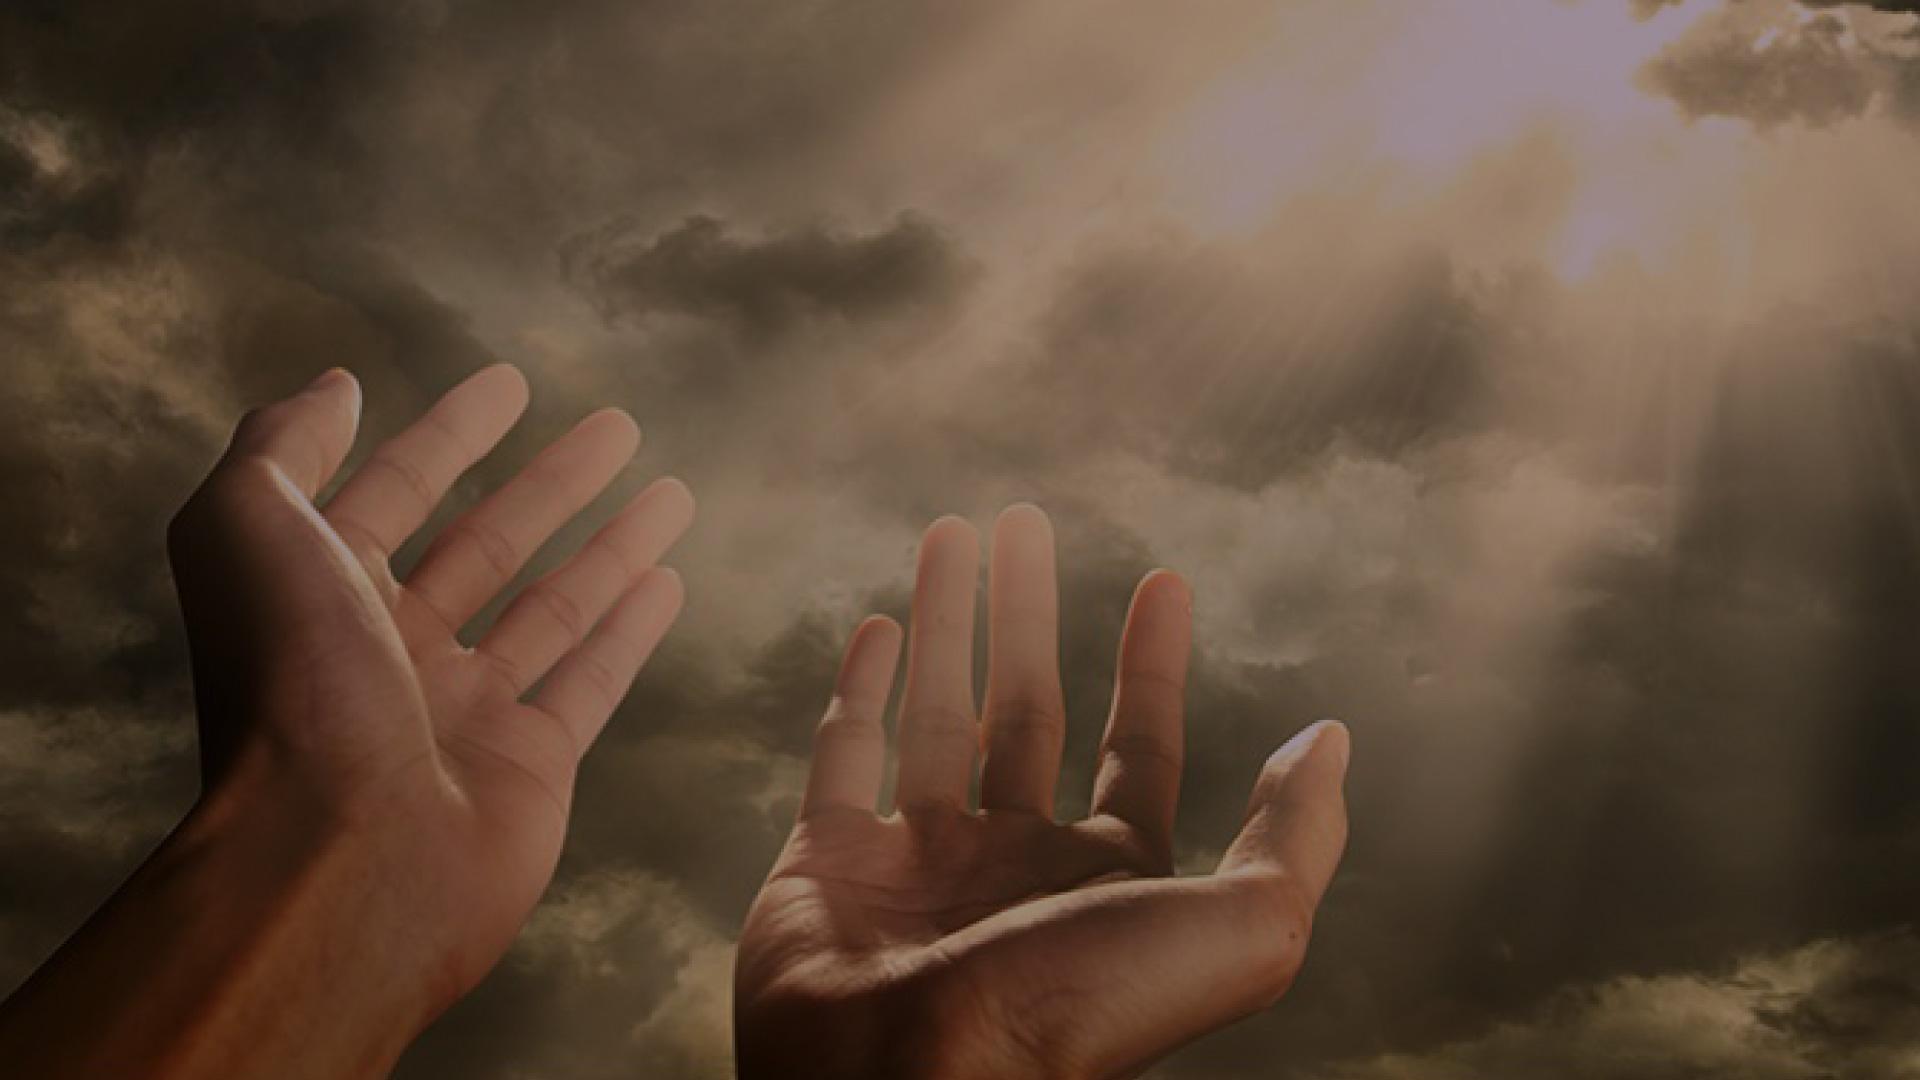 Artículos | Con toda bendición espiritual